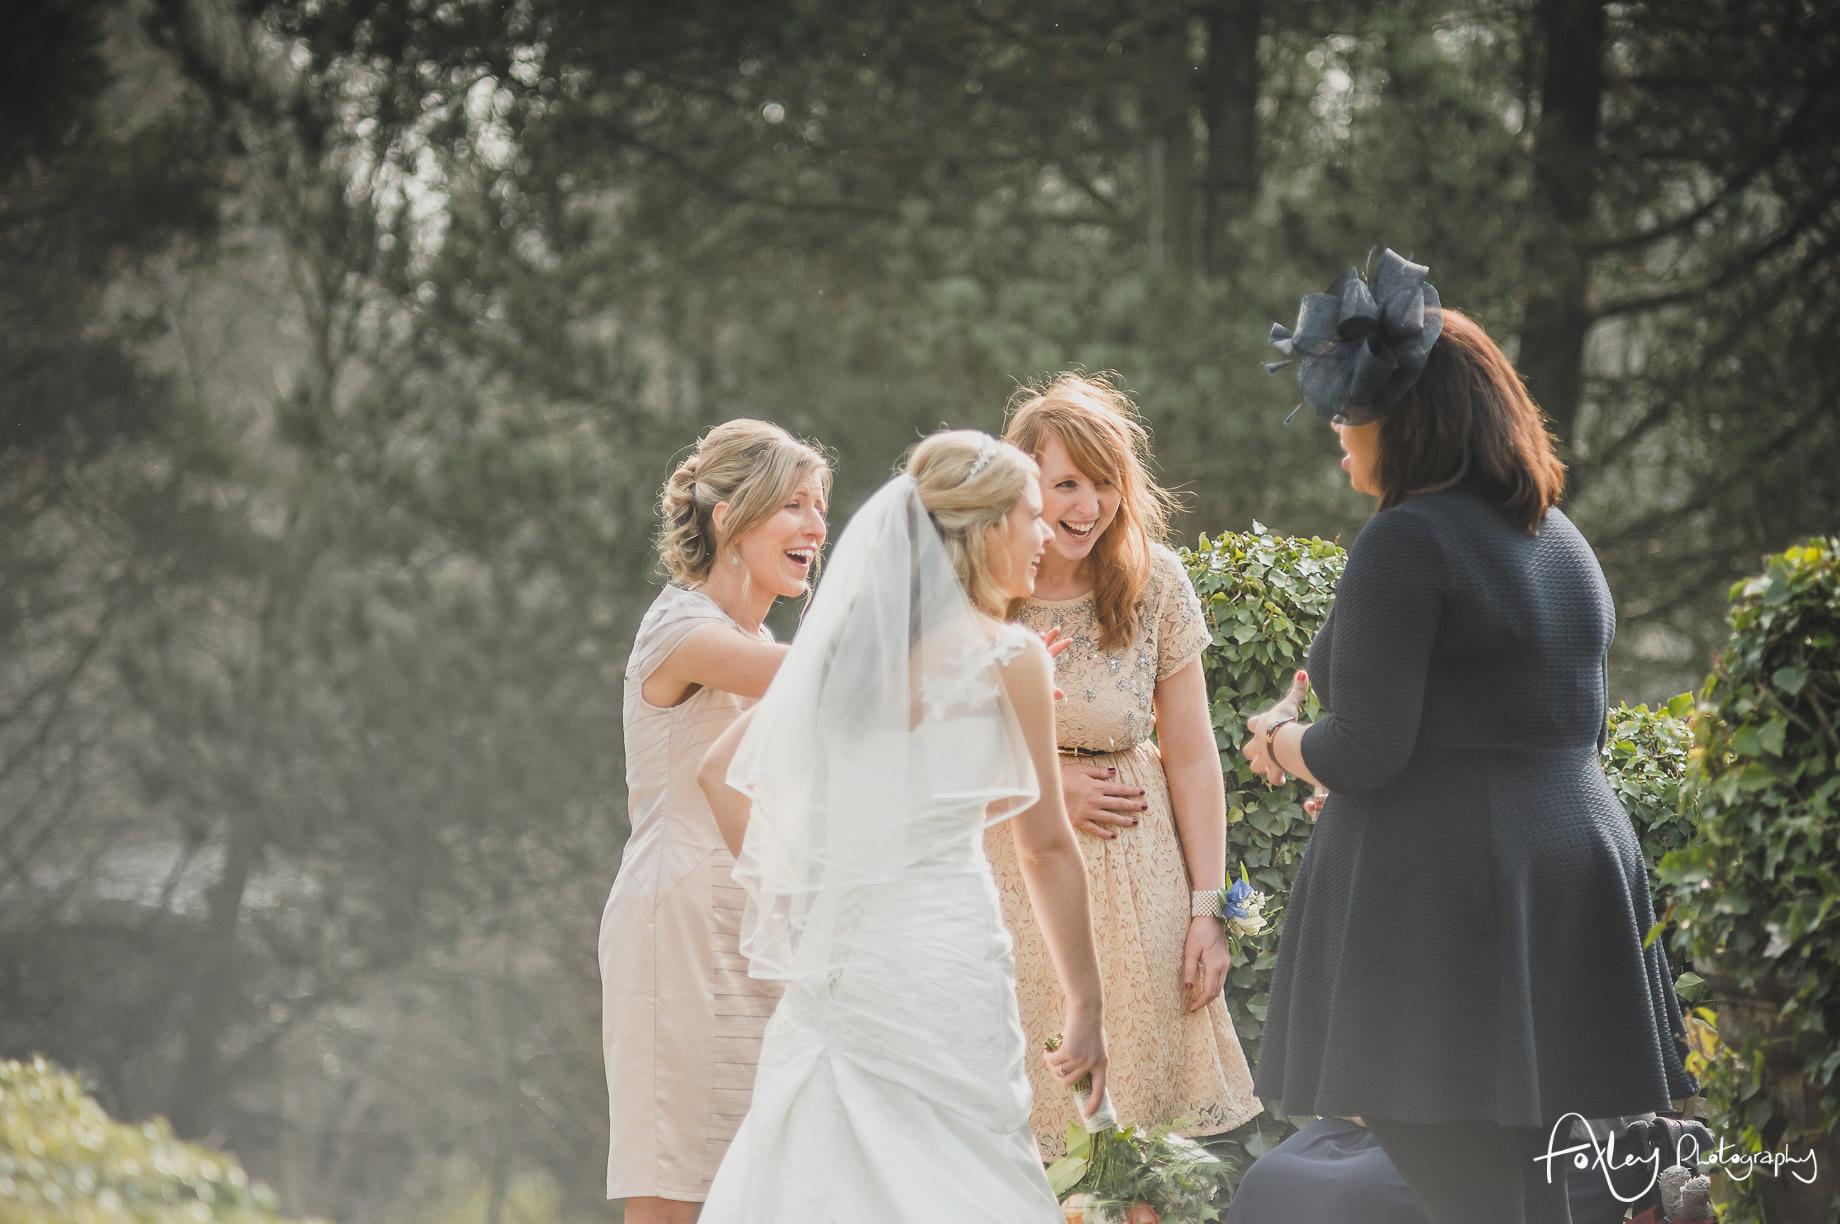 Gemma and Lewis' Wedding at Mitton Hall 118